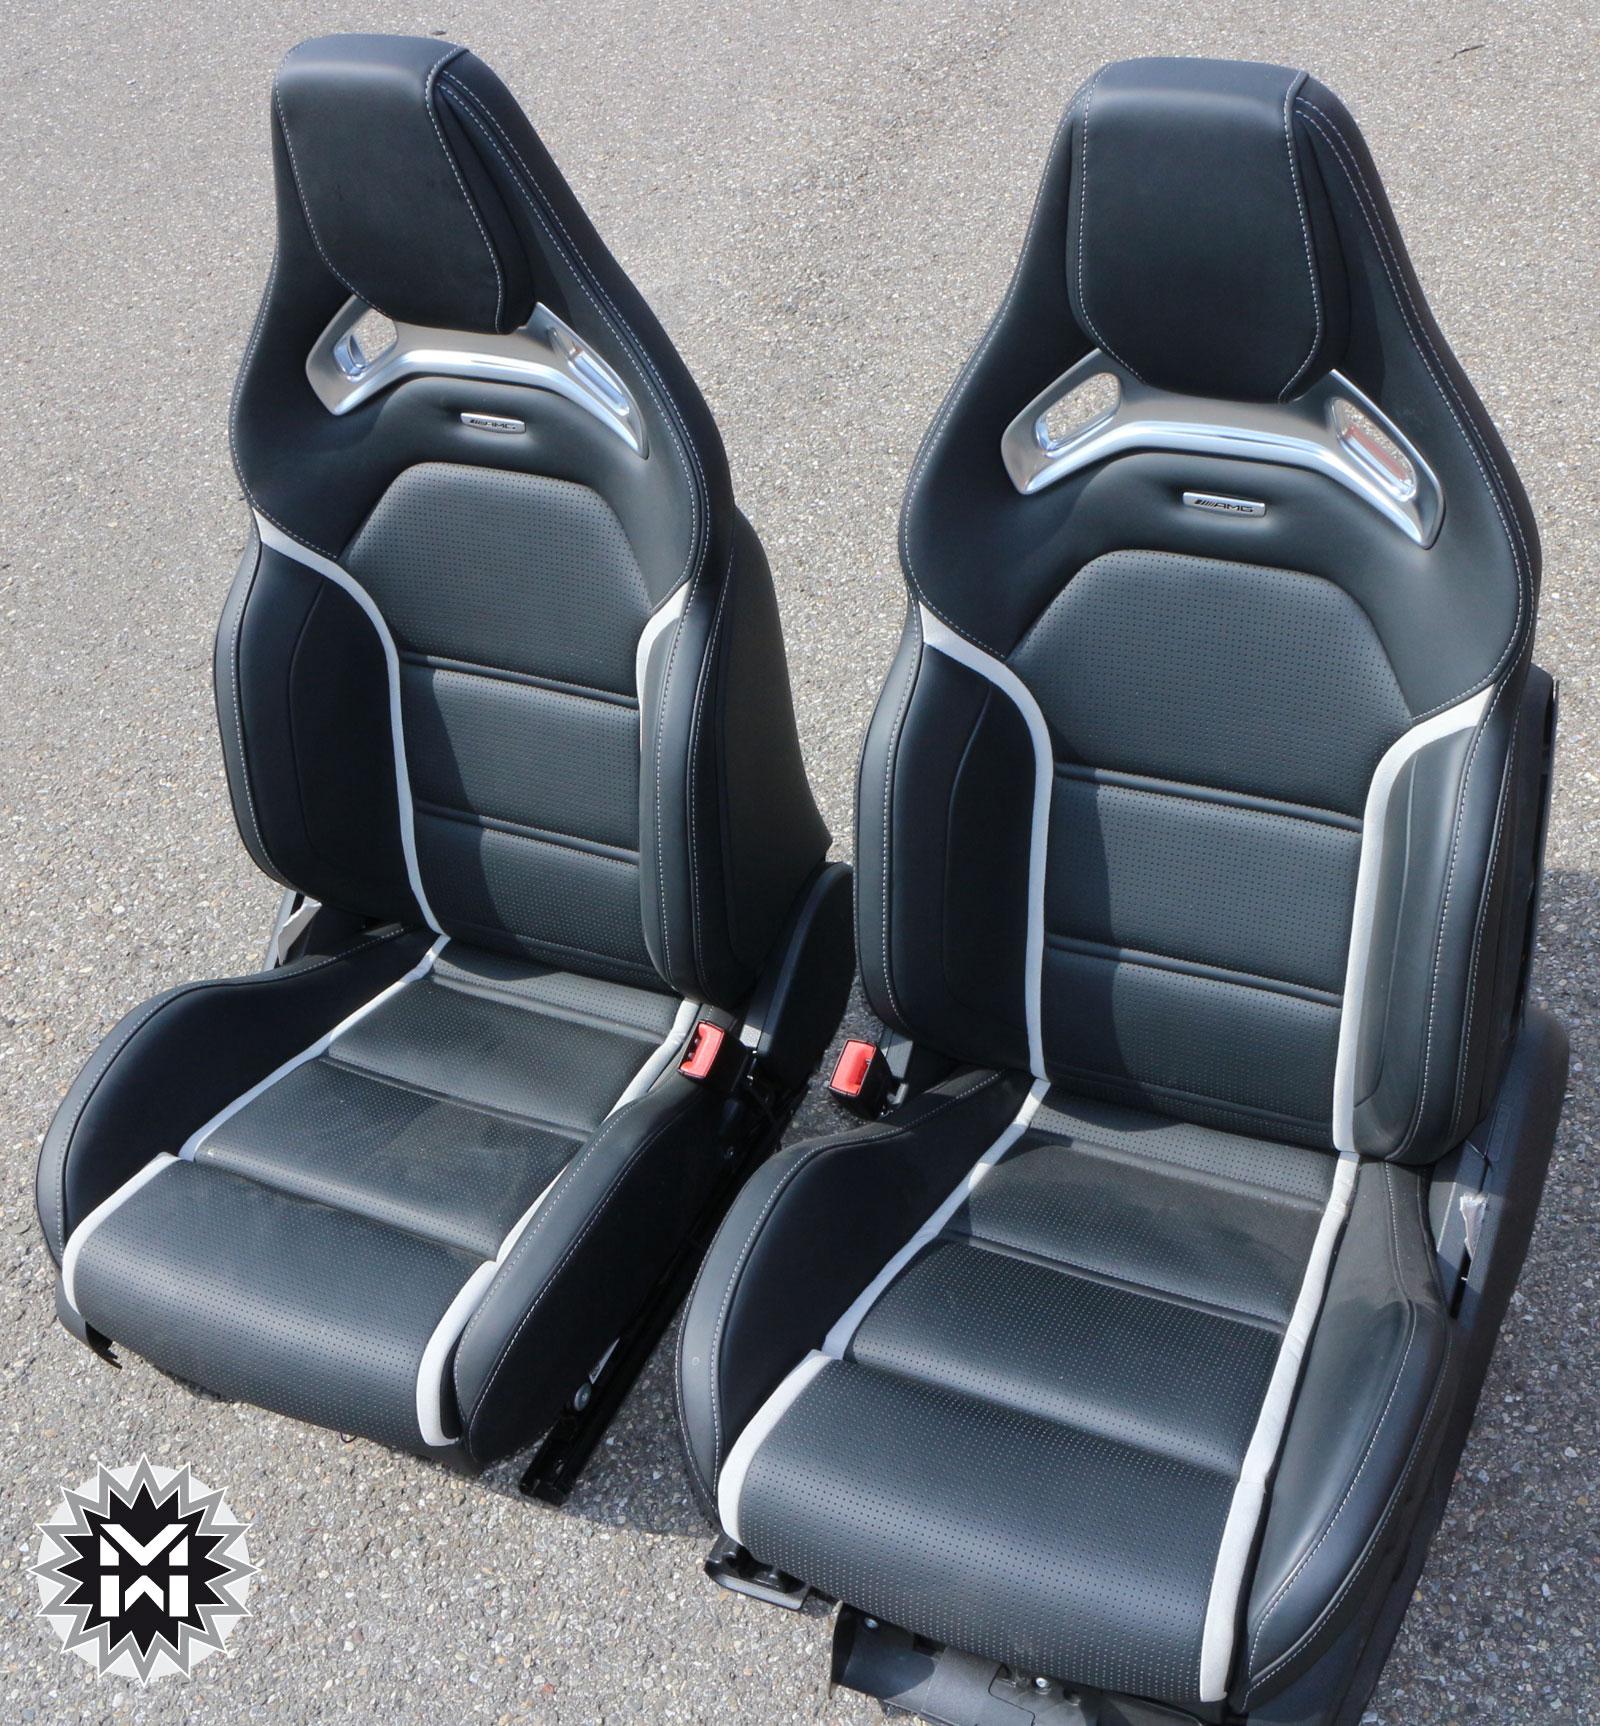 mercedes amg performance fahrersitz sitz leder c klasse w205 s205 63 amg ebay. Black Bedroom Furniture Sets. Home Design Ideas